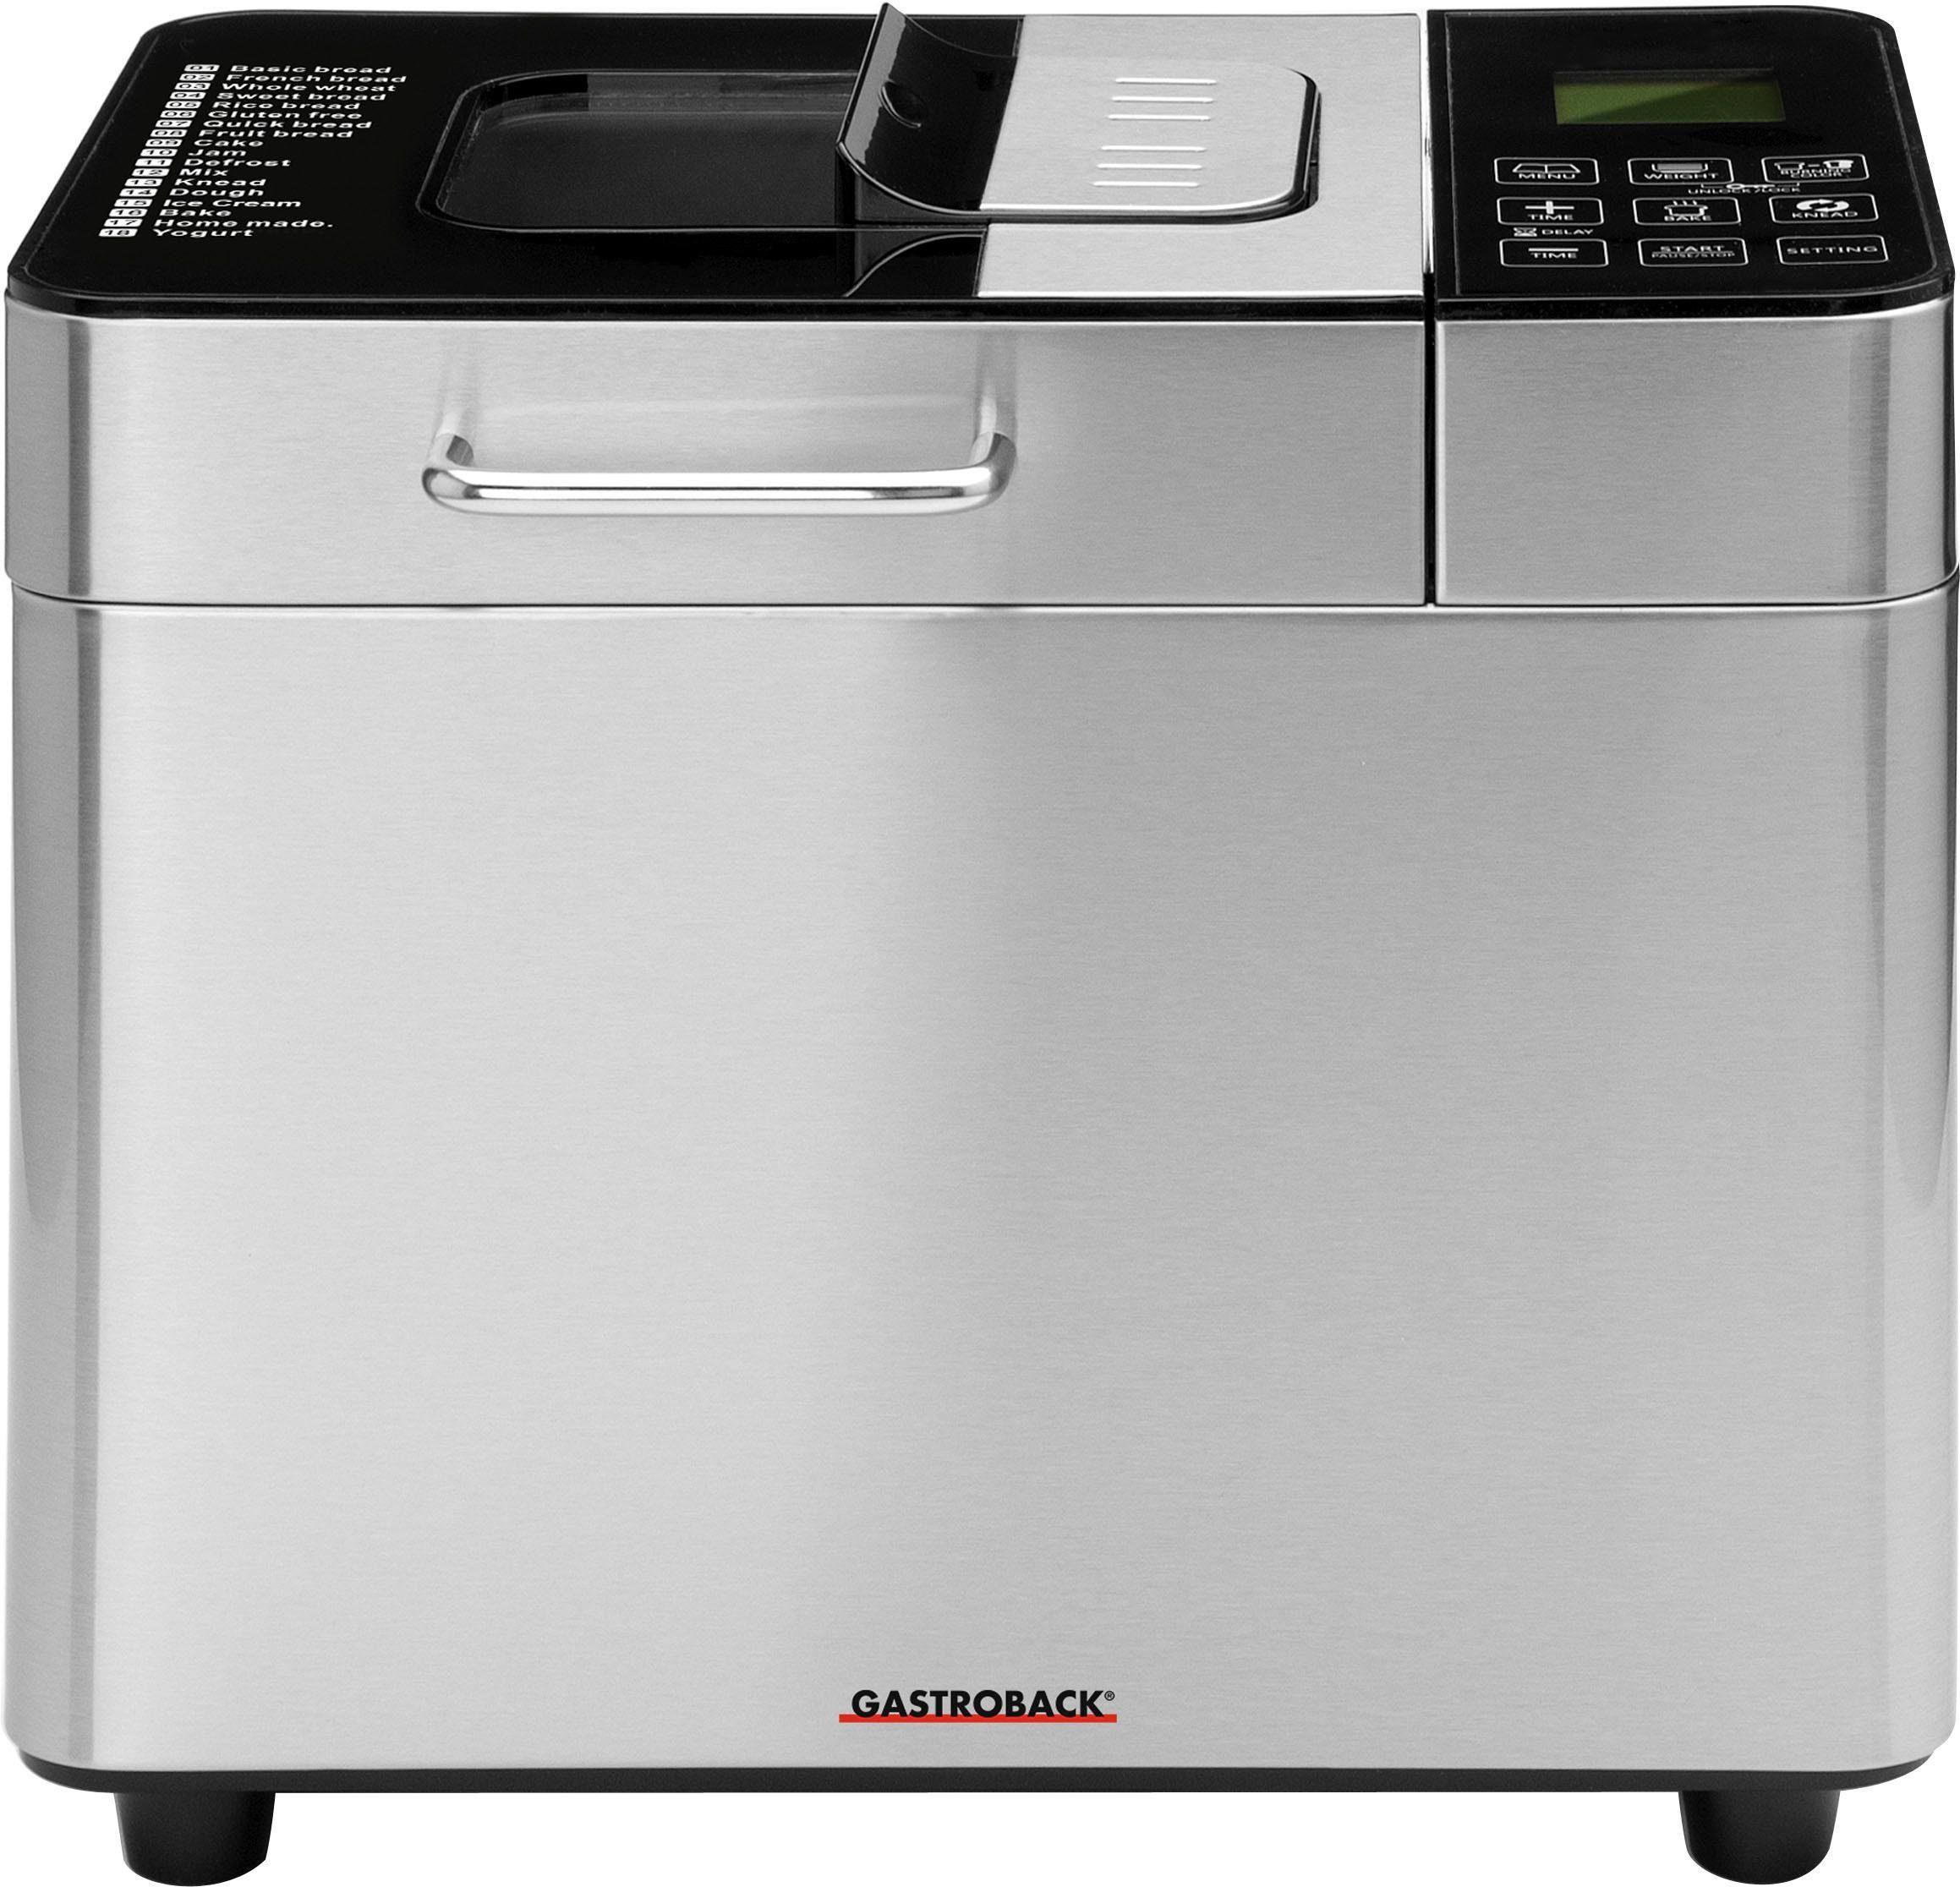 Gastroback Brotbackautomat 42823 Advanced, 18 Programme, 550 W